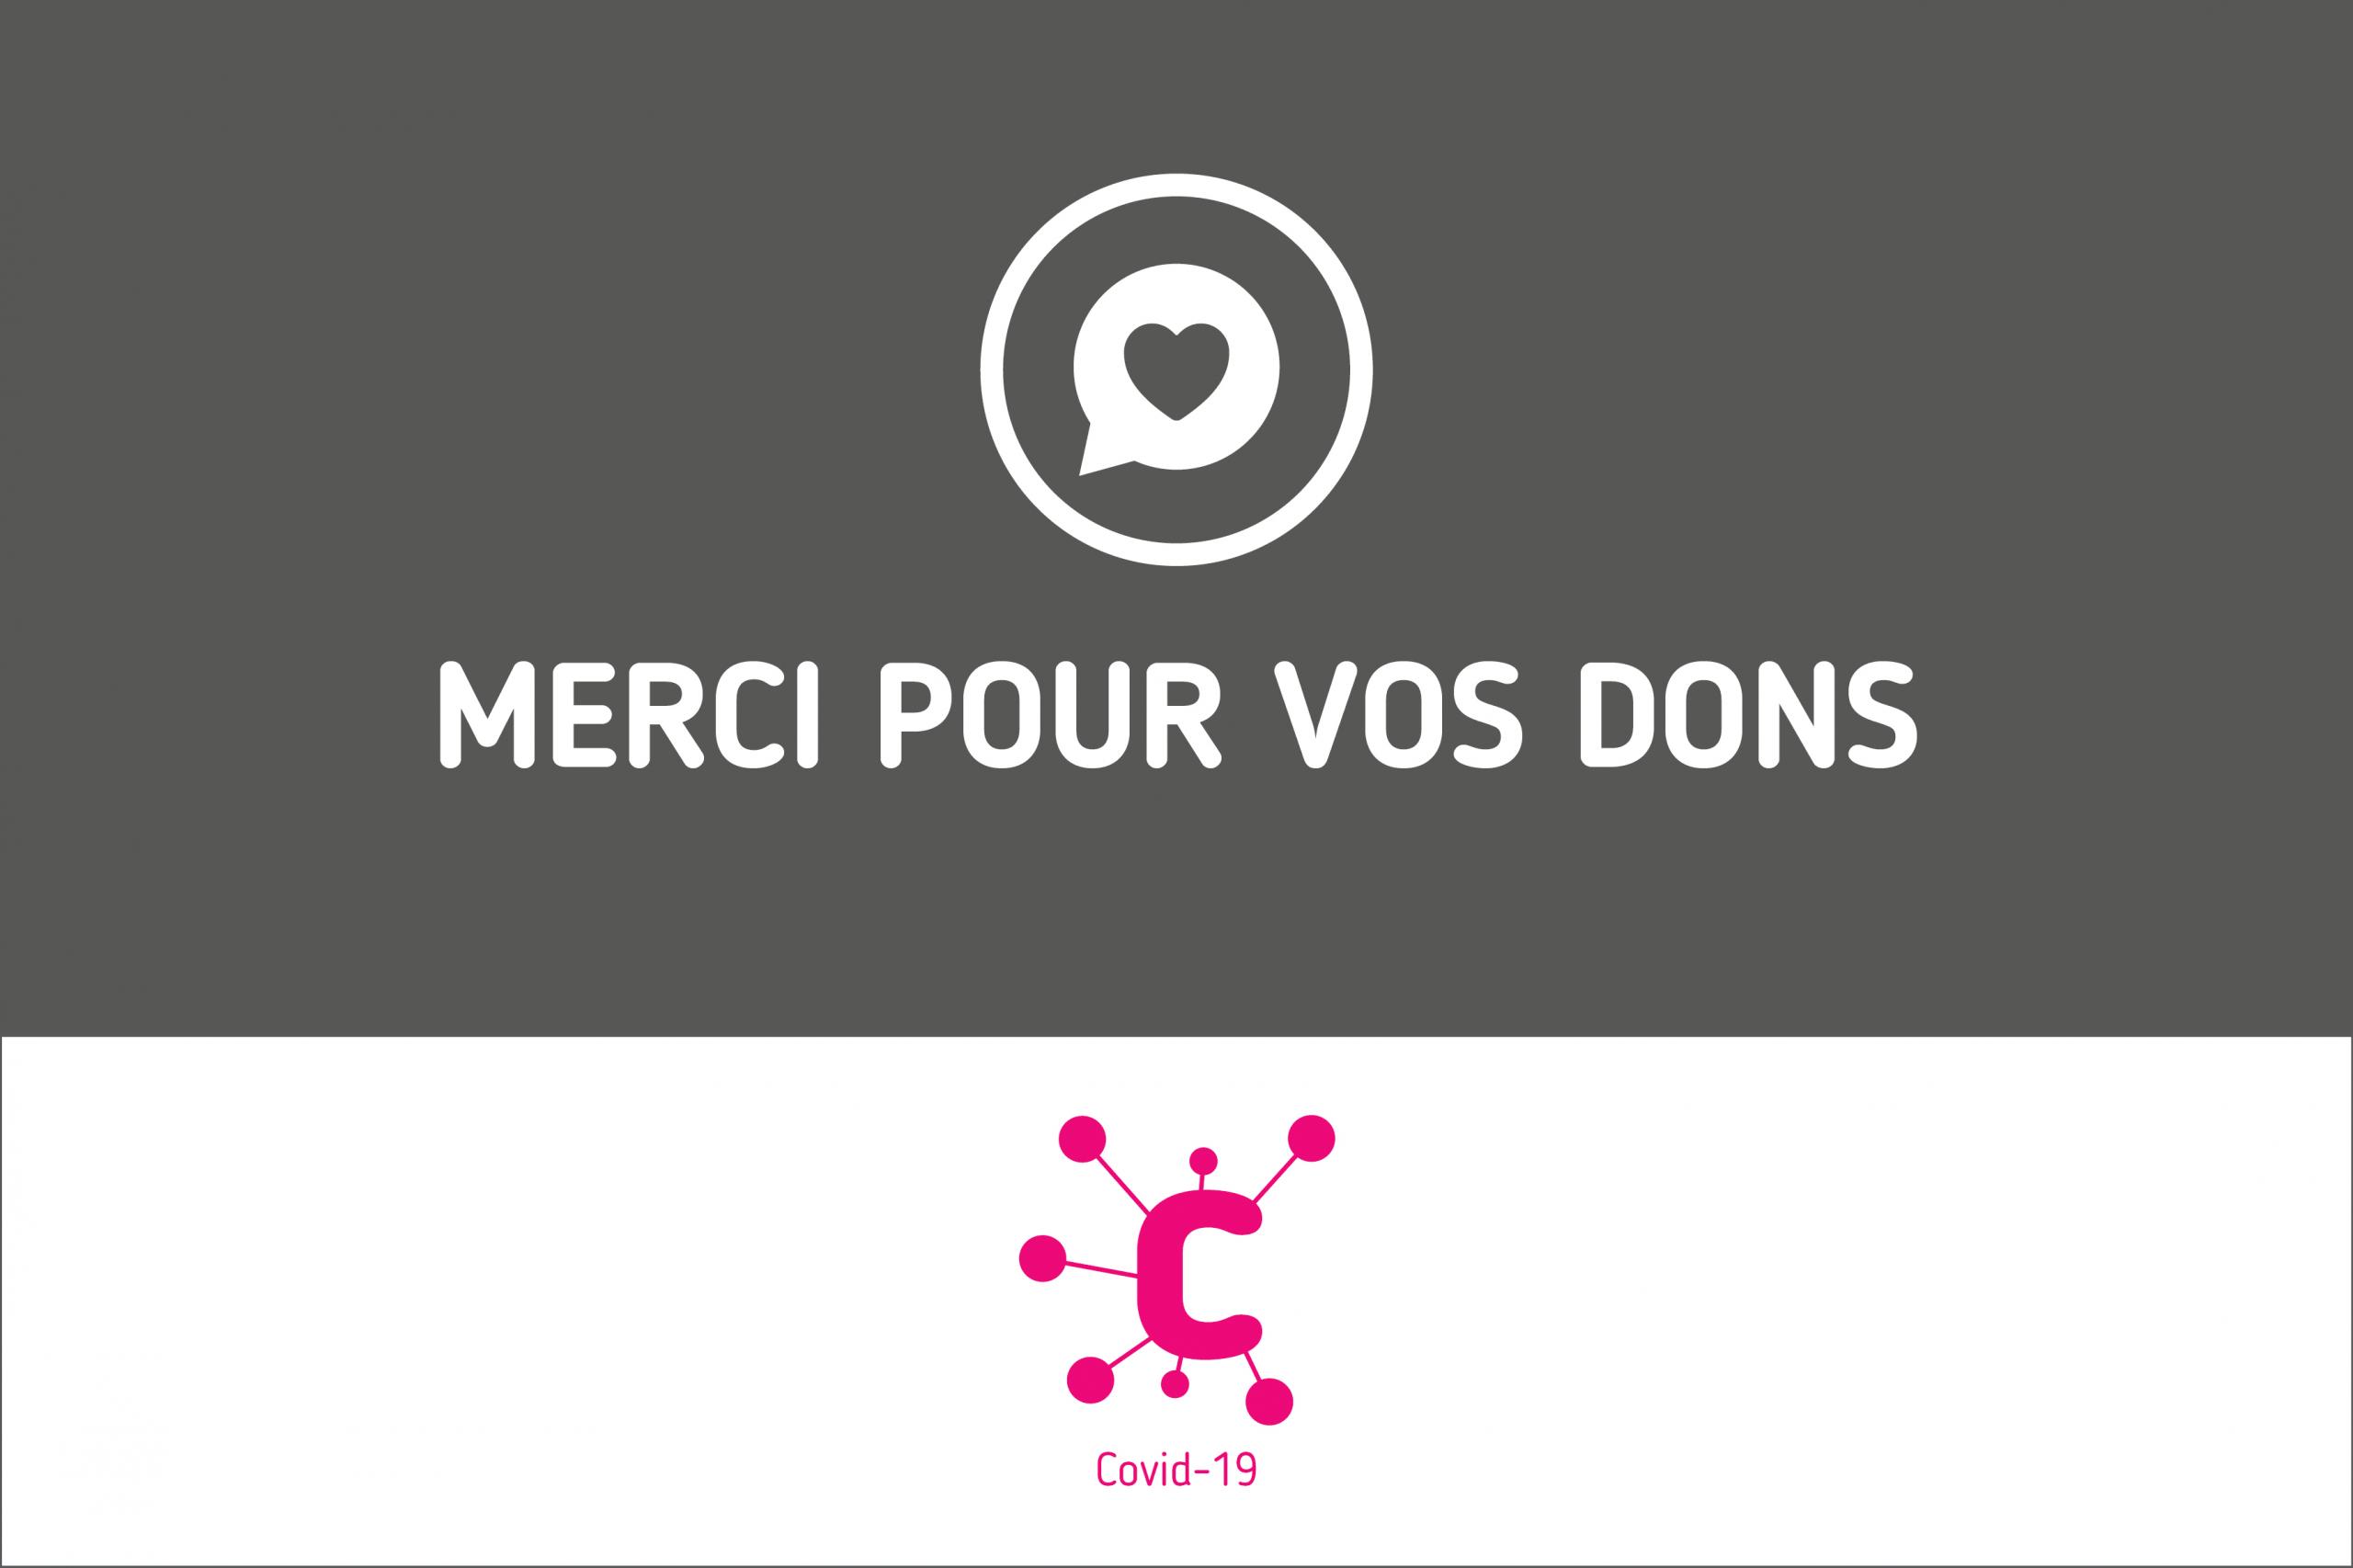 CORONAVIRUS : MERCI pour vos dons